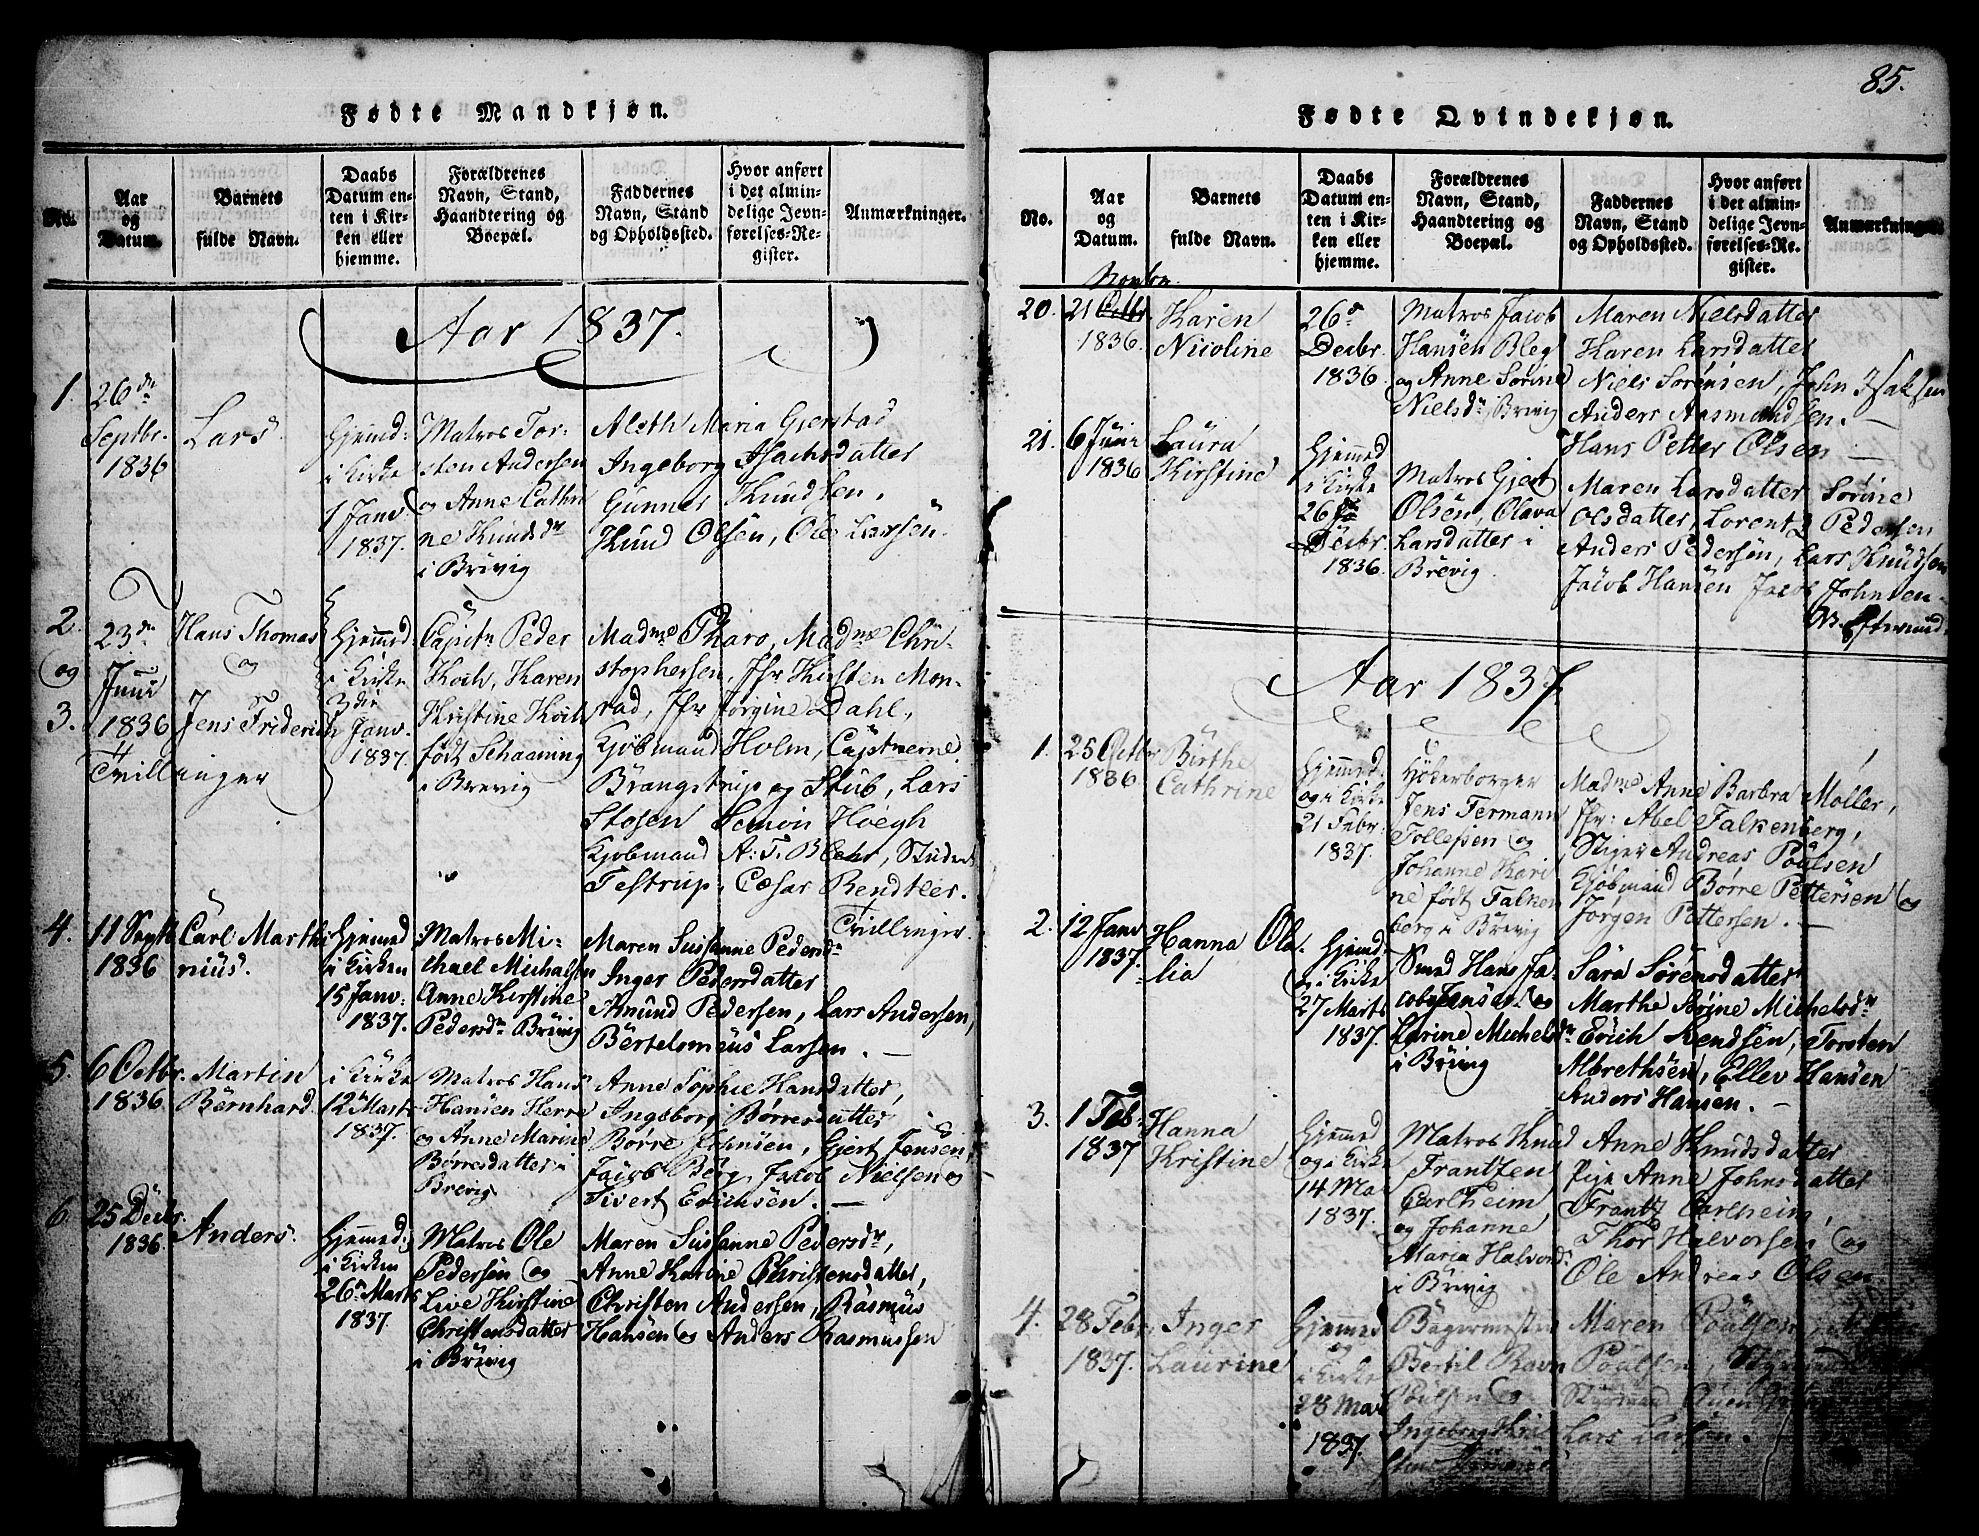 SAKO, Brevik kirkebøker, G/Ga/L0001: Klokkerbok nr. 1, 1814-1845, s. 85